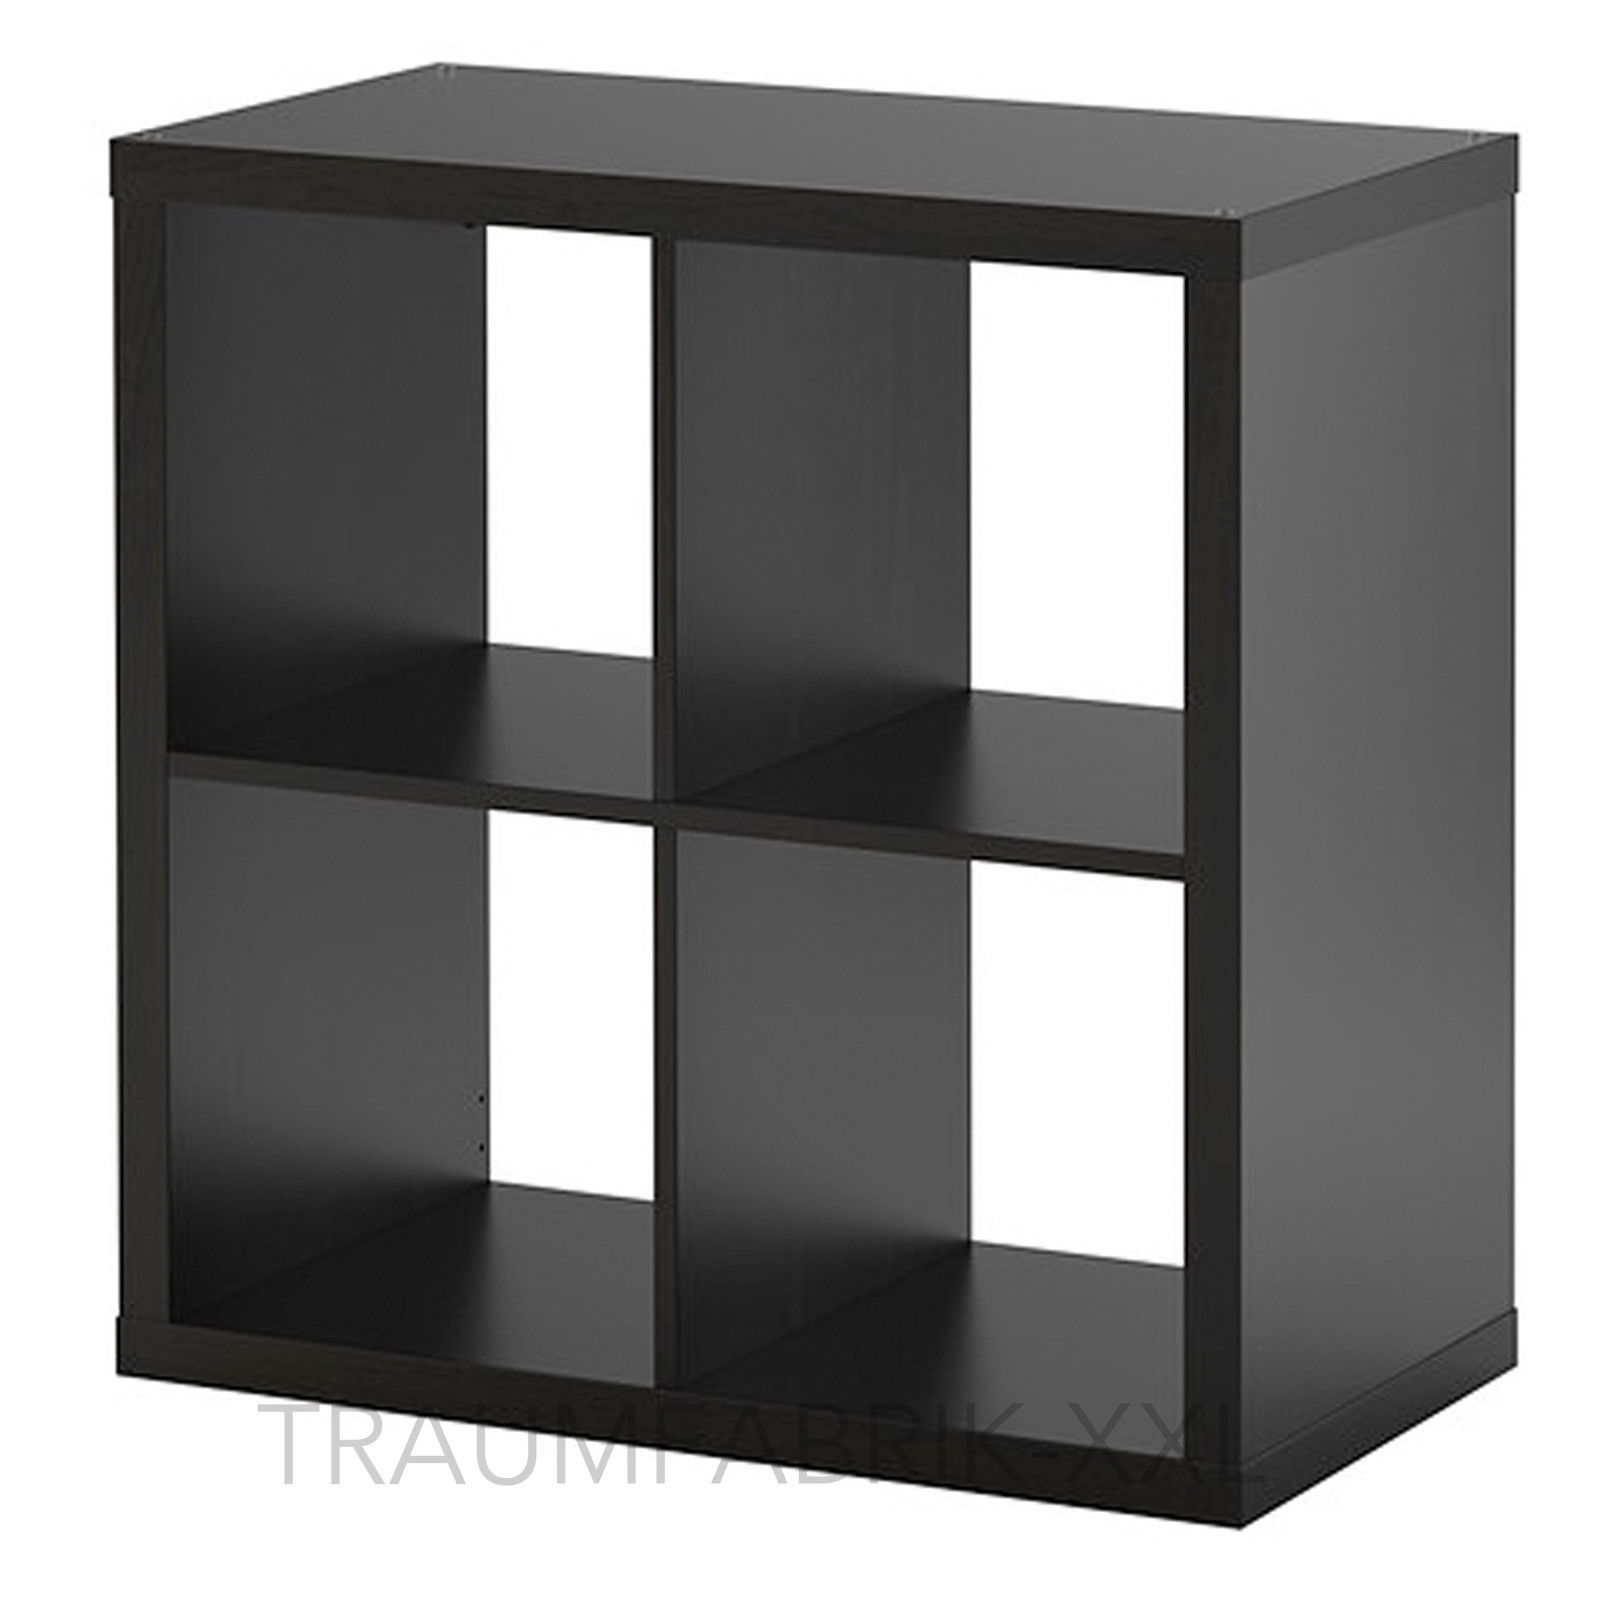 IKEA KALLAX STAURAUMREGAL schwarz braun 77x77cm BÜCHERREGAL REGAL WANDREGAL NEU  Traumfabrik XXL